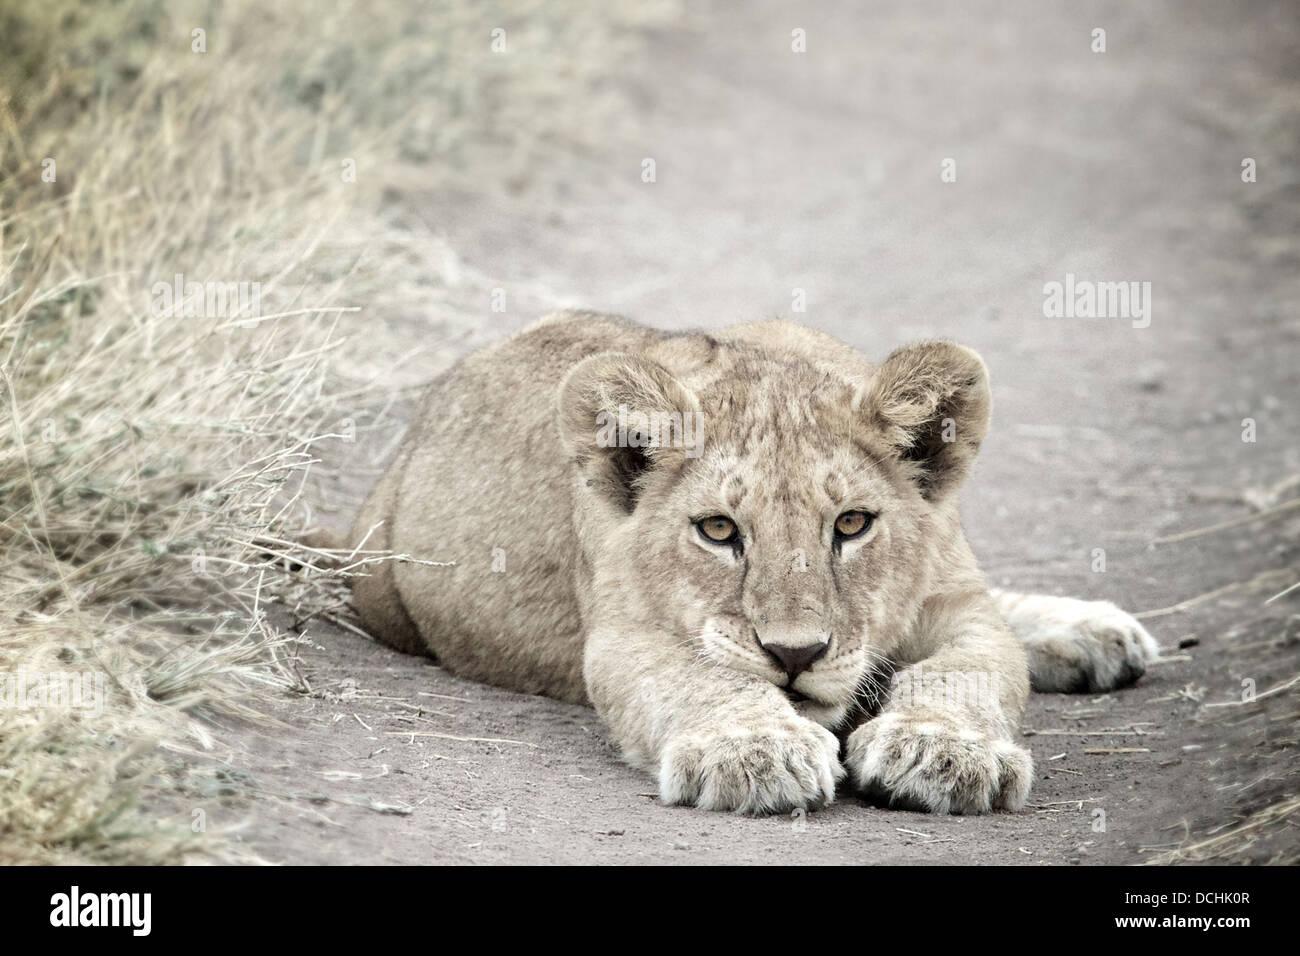 Junge Löwenjunges. Panthera Leo Serengeti Nationalpark. Tansania Stockbild